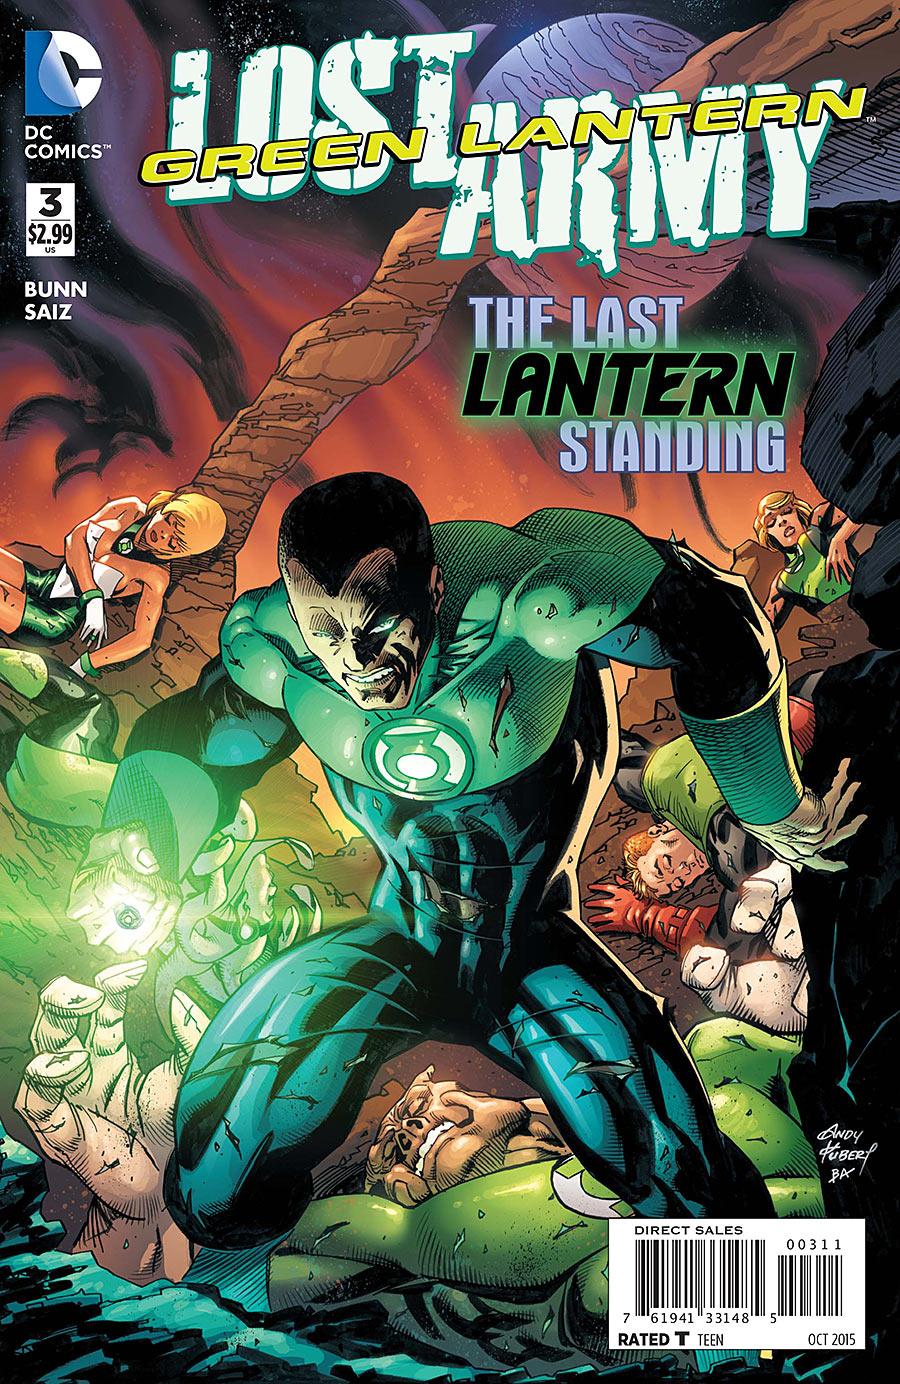 Green Lantern: The Lost Army Vol 1 3